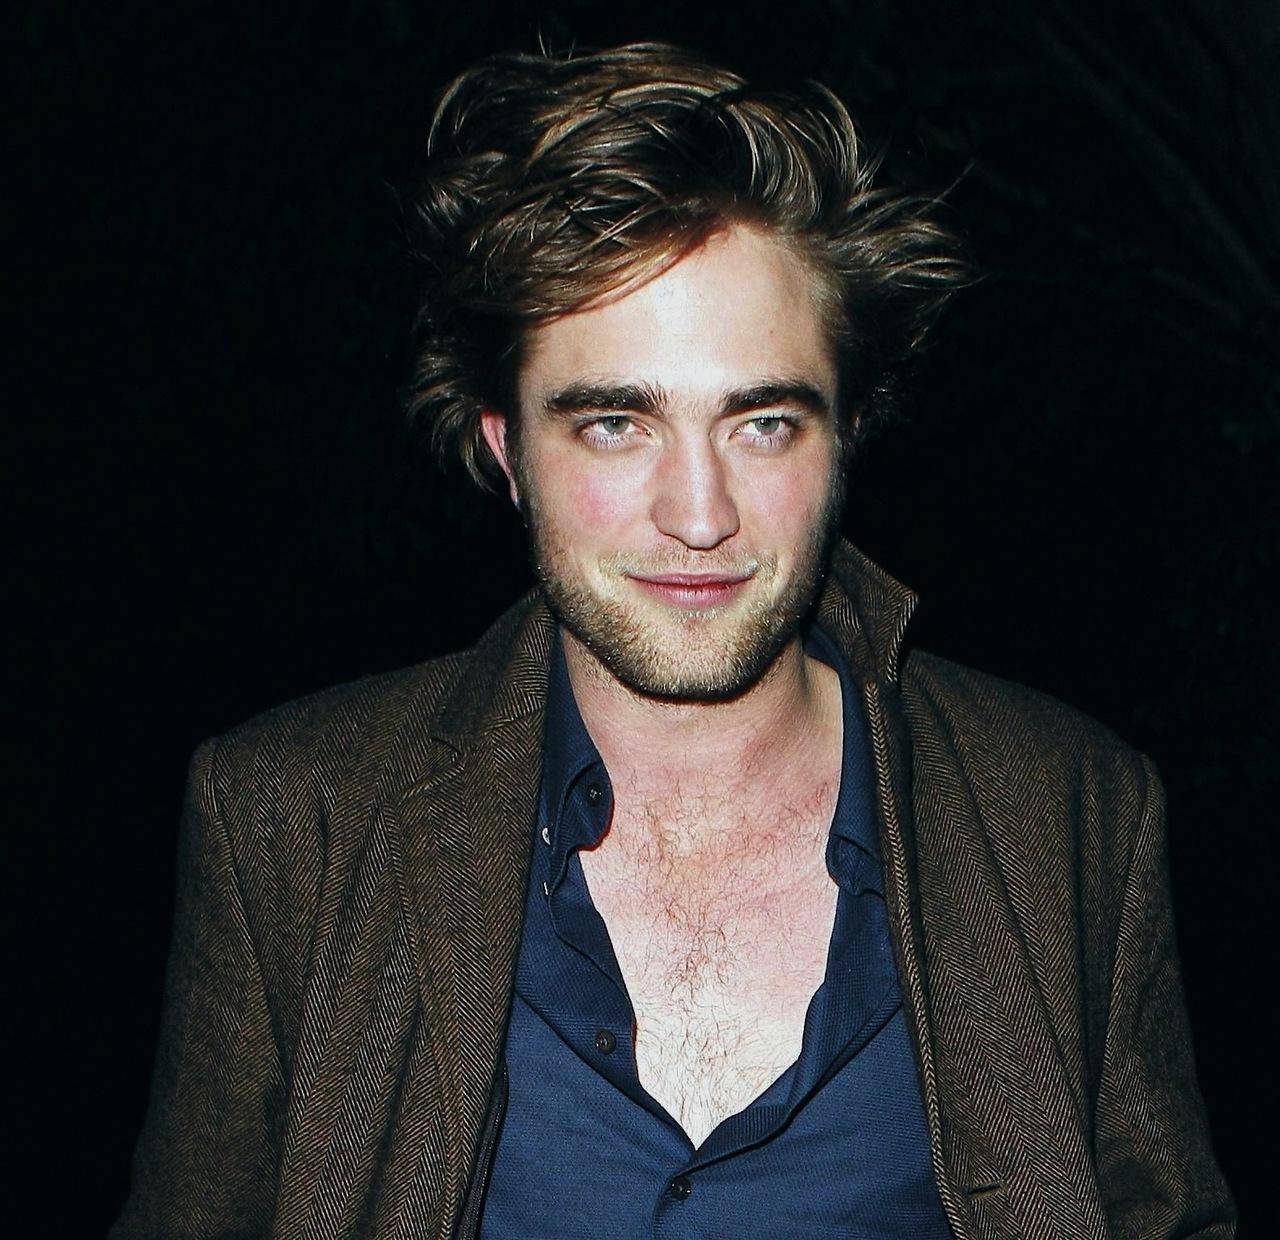 New/Old Robert Pattinson pics